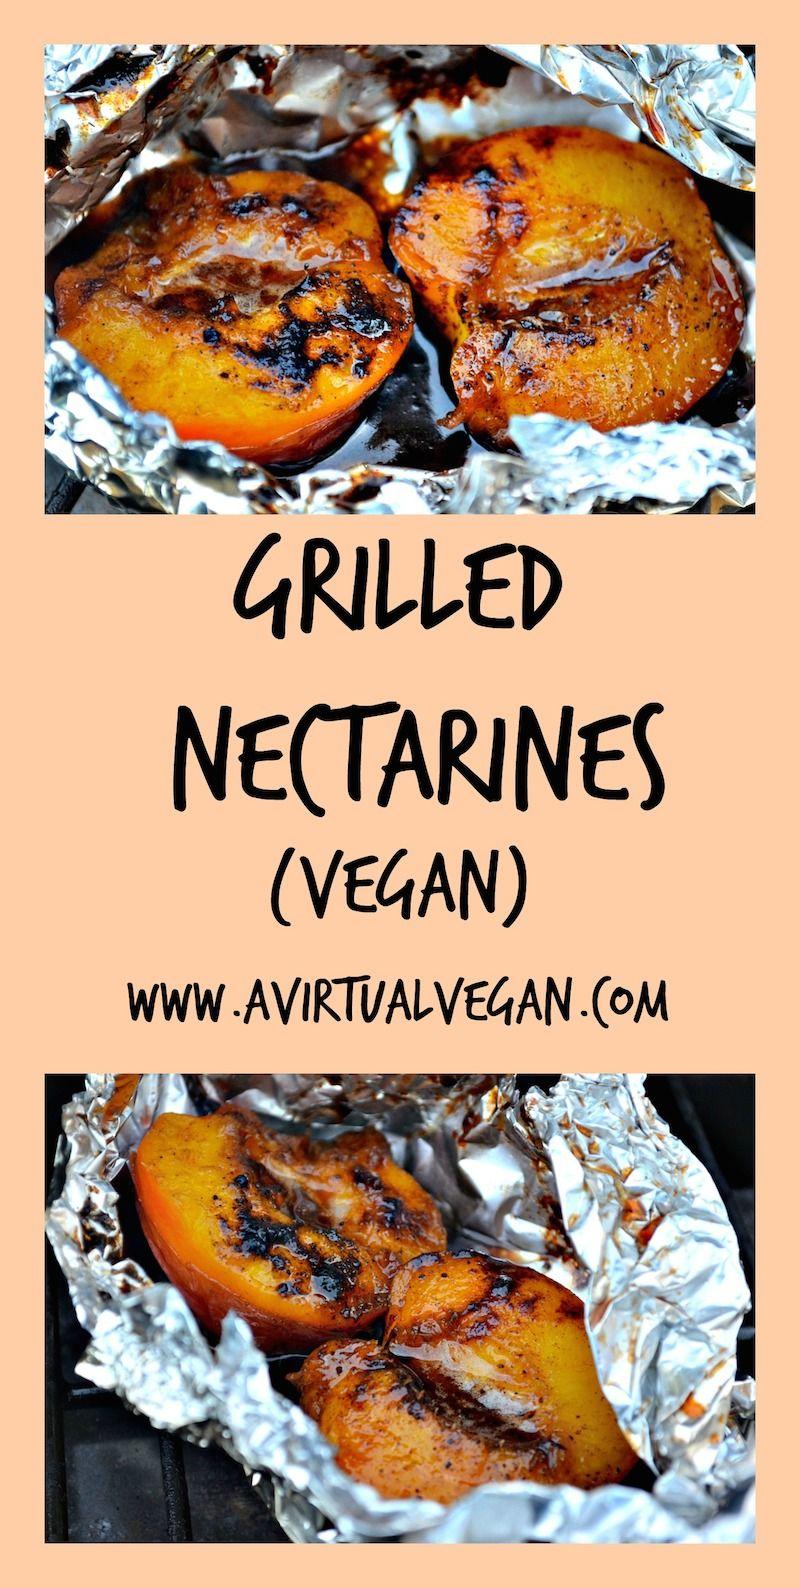 Grilled Nectarines Recipe Food recipes, Vegan grilling